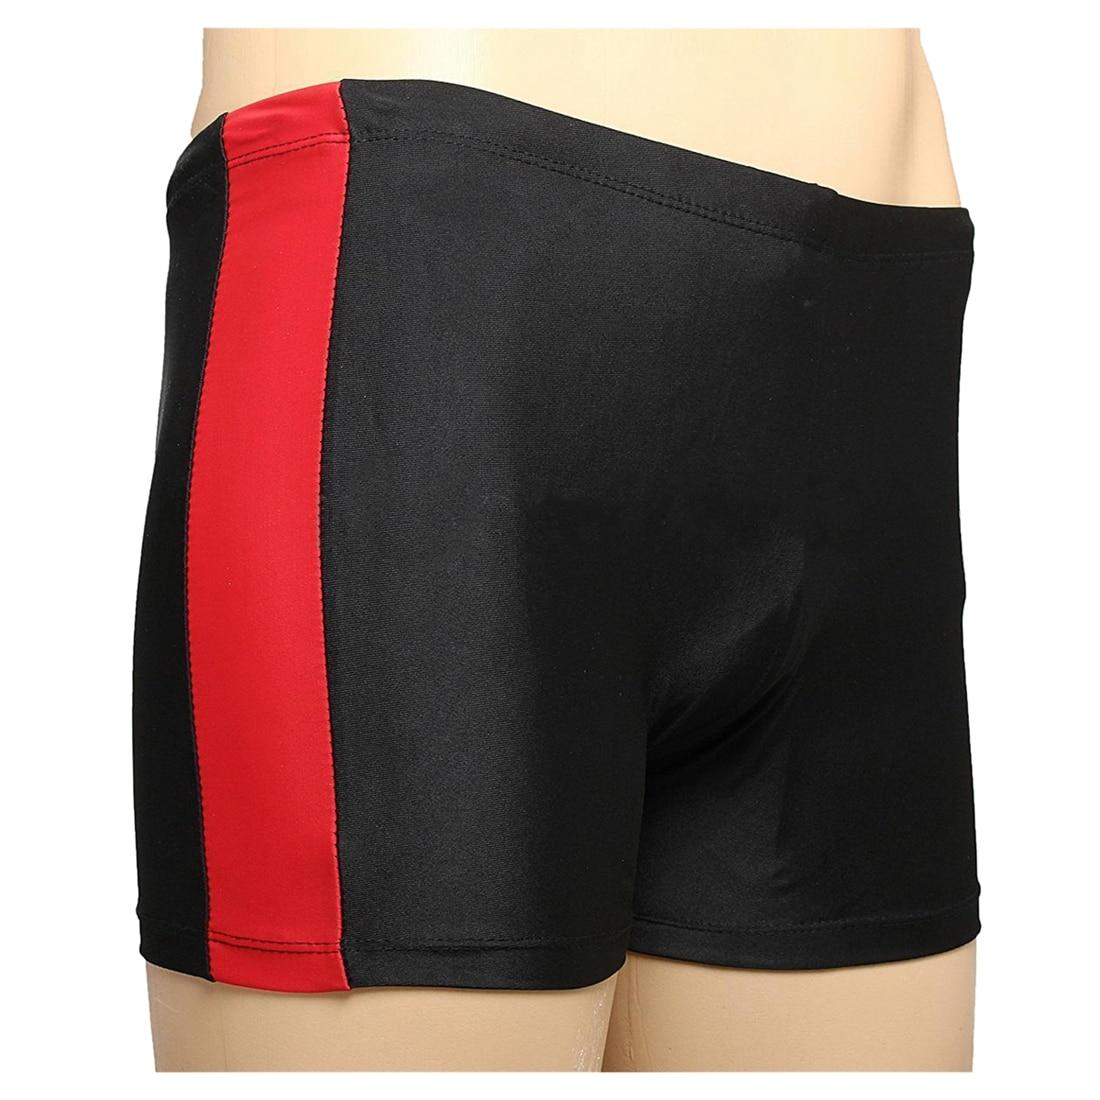 Mens Beach Boxer Briefs Swimming Trunks Shorts Pants Swimwears Underwear